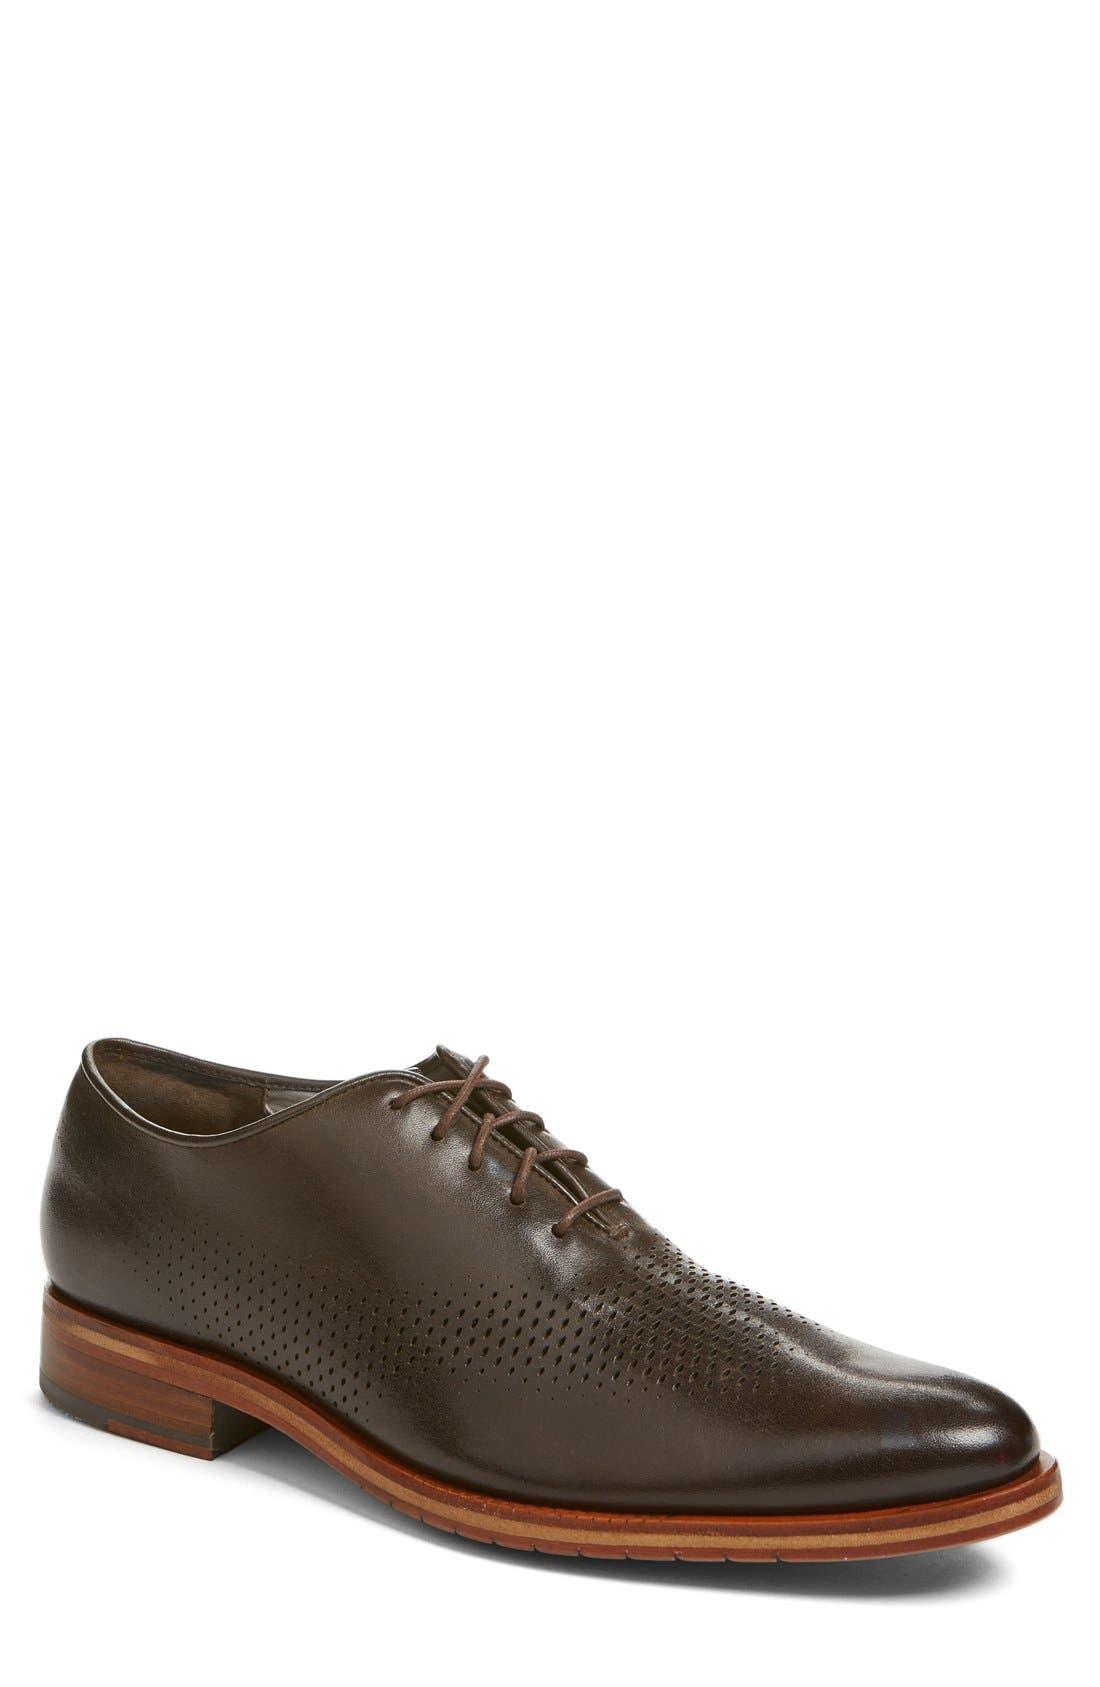 Cole Haan 'Washington' Plain Toe Oxford (Men)